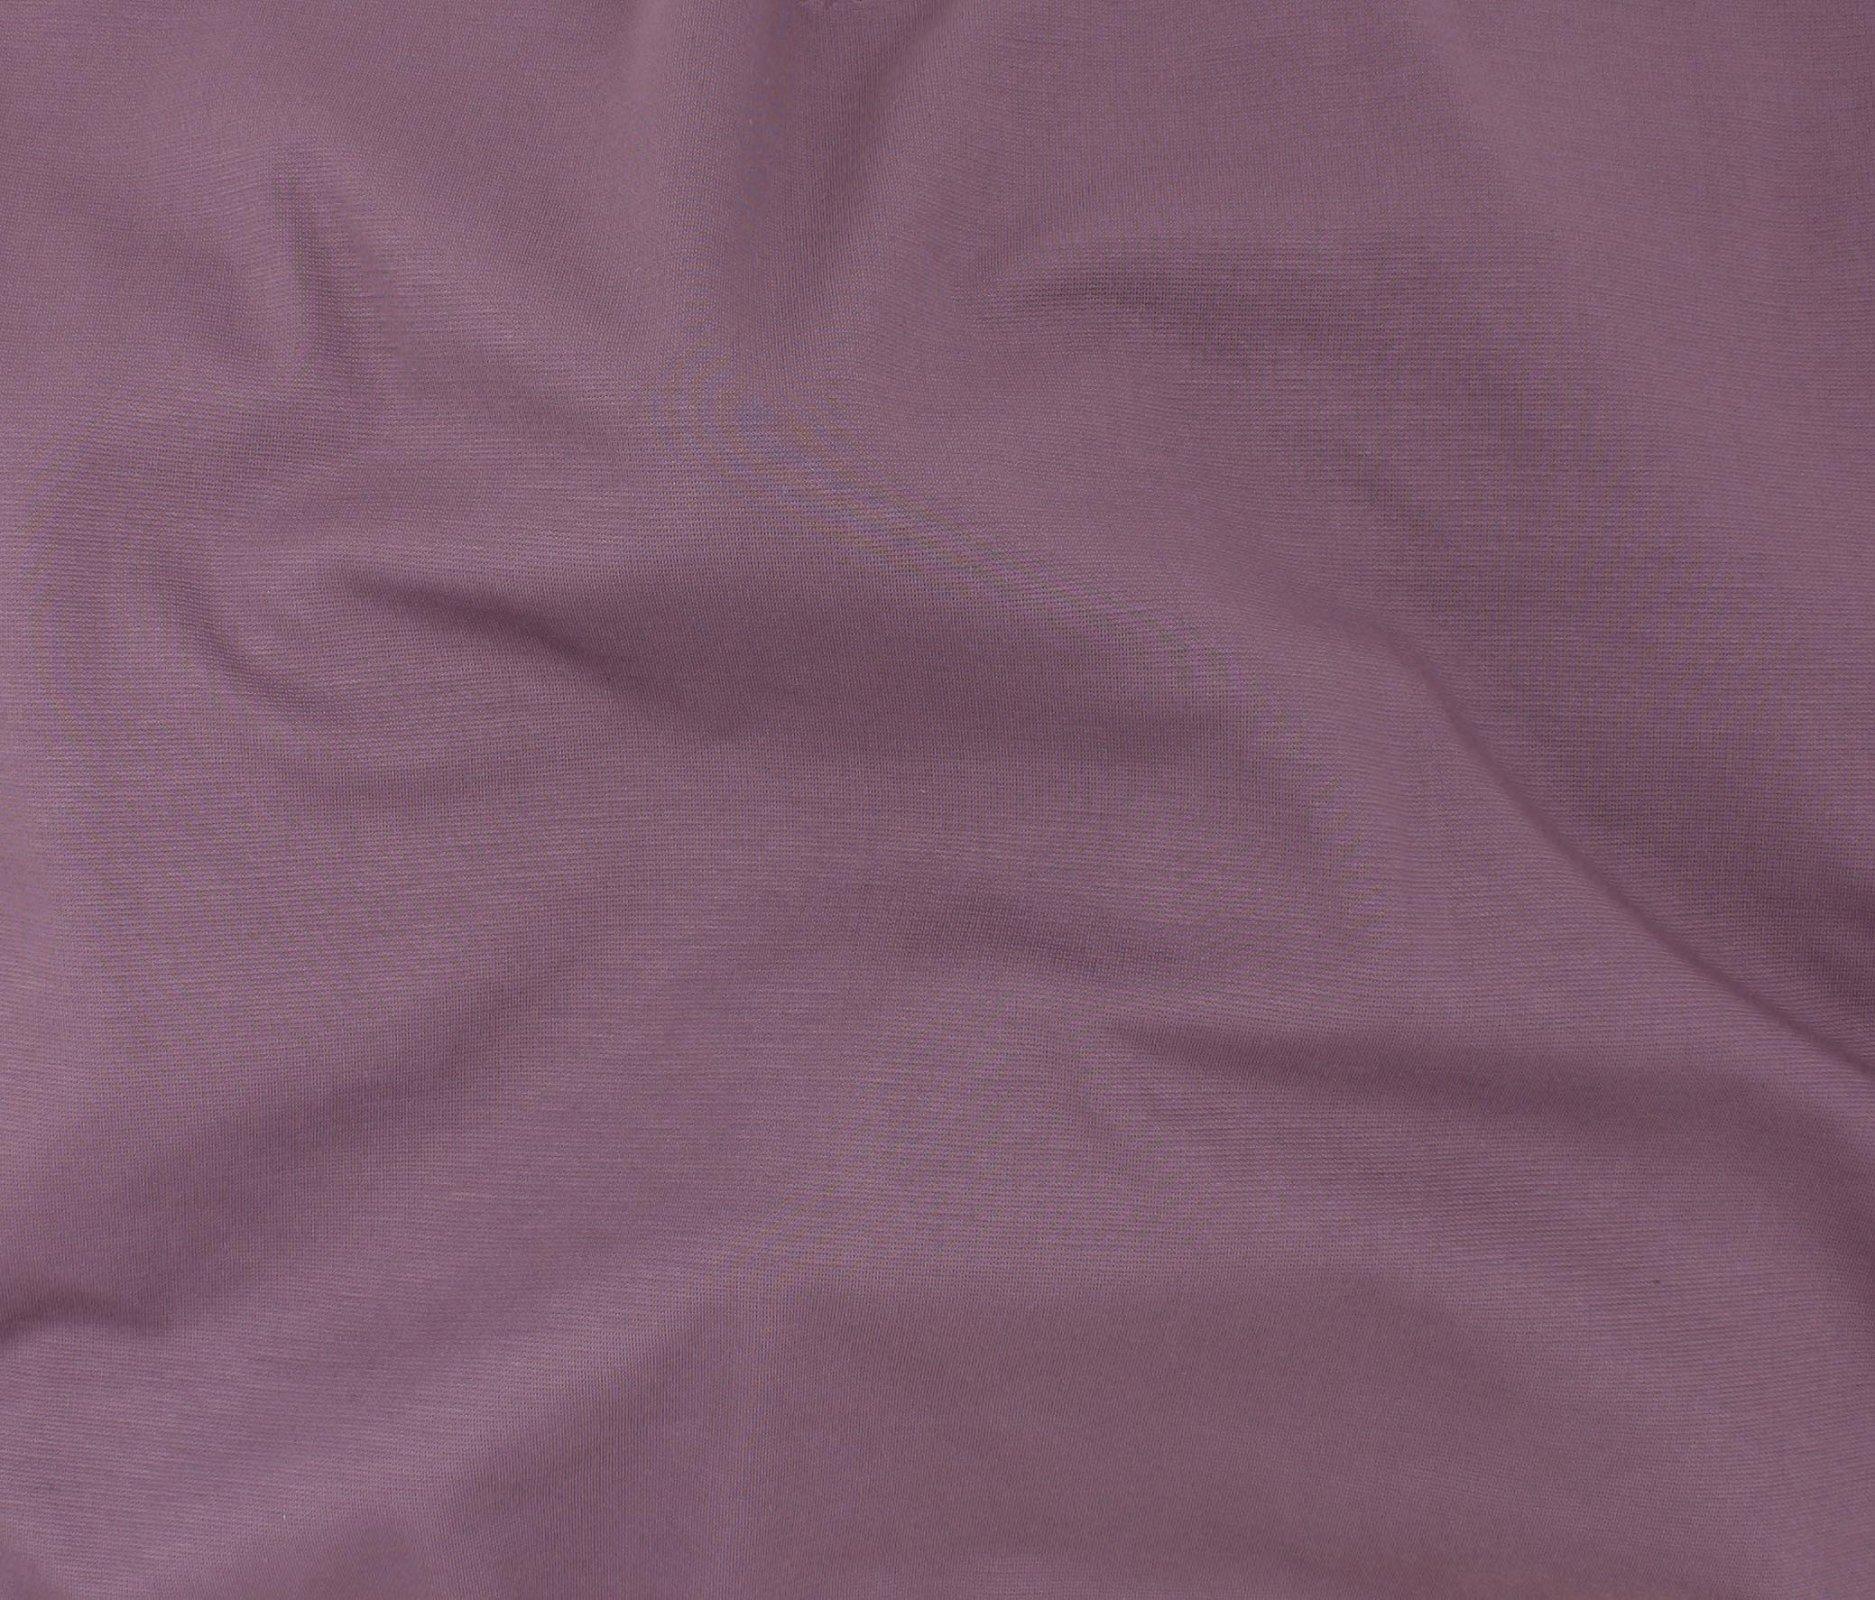 Ponte Leggero - Dusty Violet